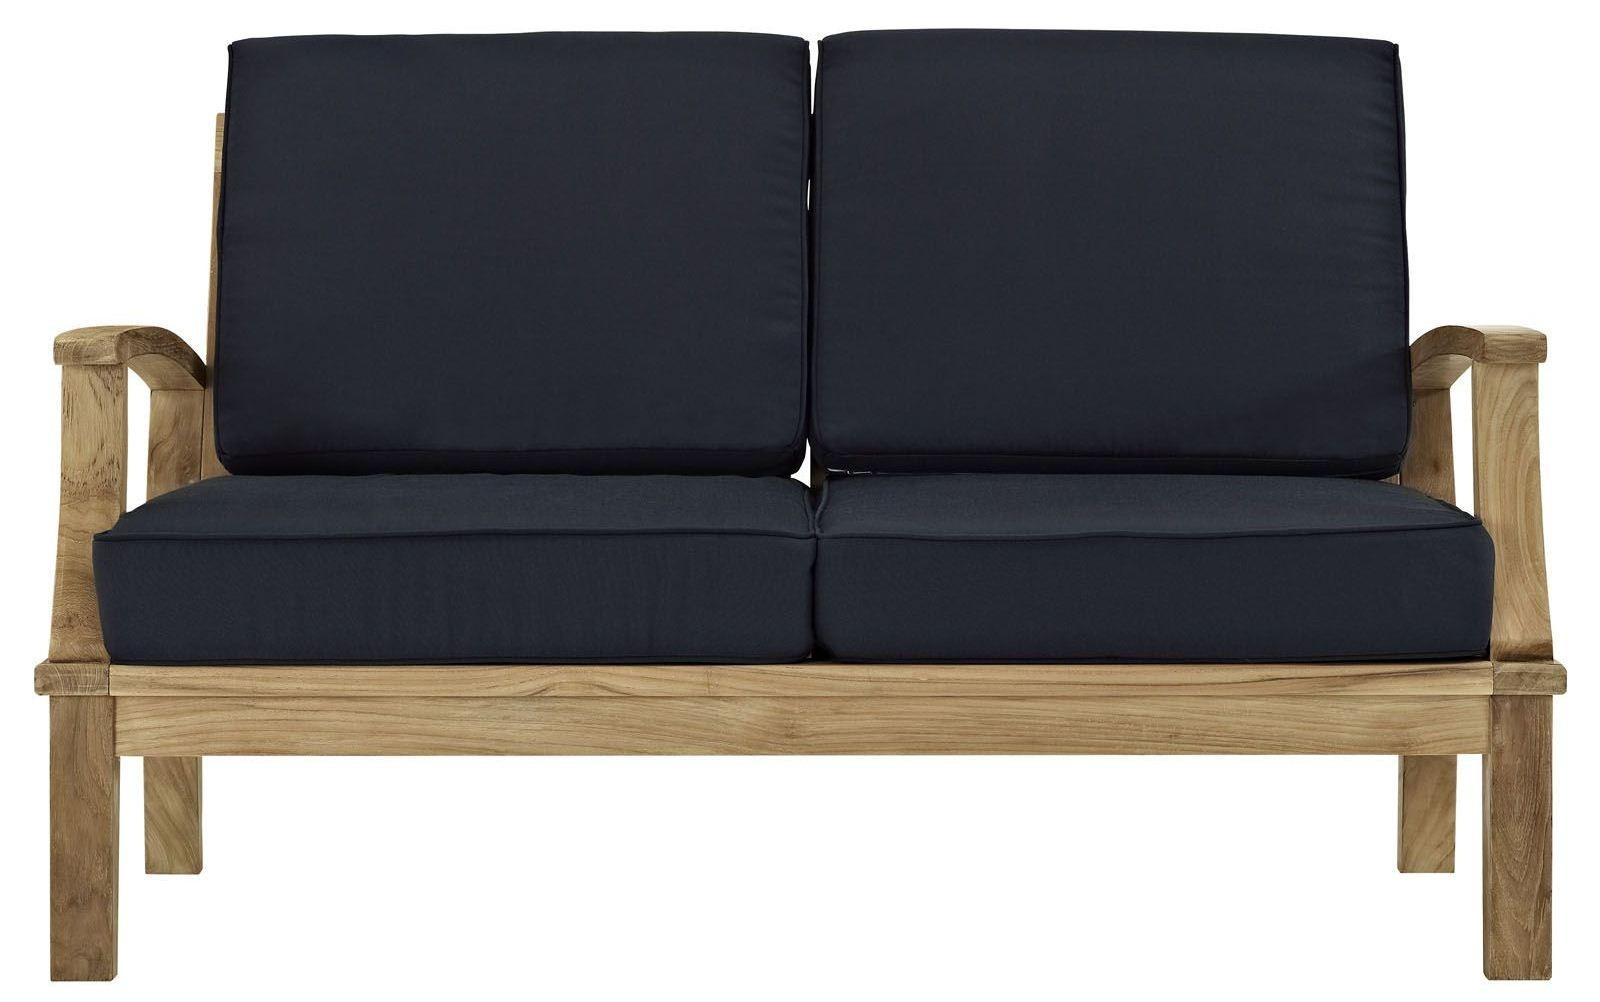 Marina Natural Navy Outdoor Patio Teak Loveseat From Renegade Eei 1144 Coleman Furniture